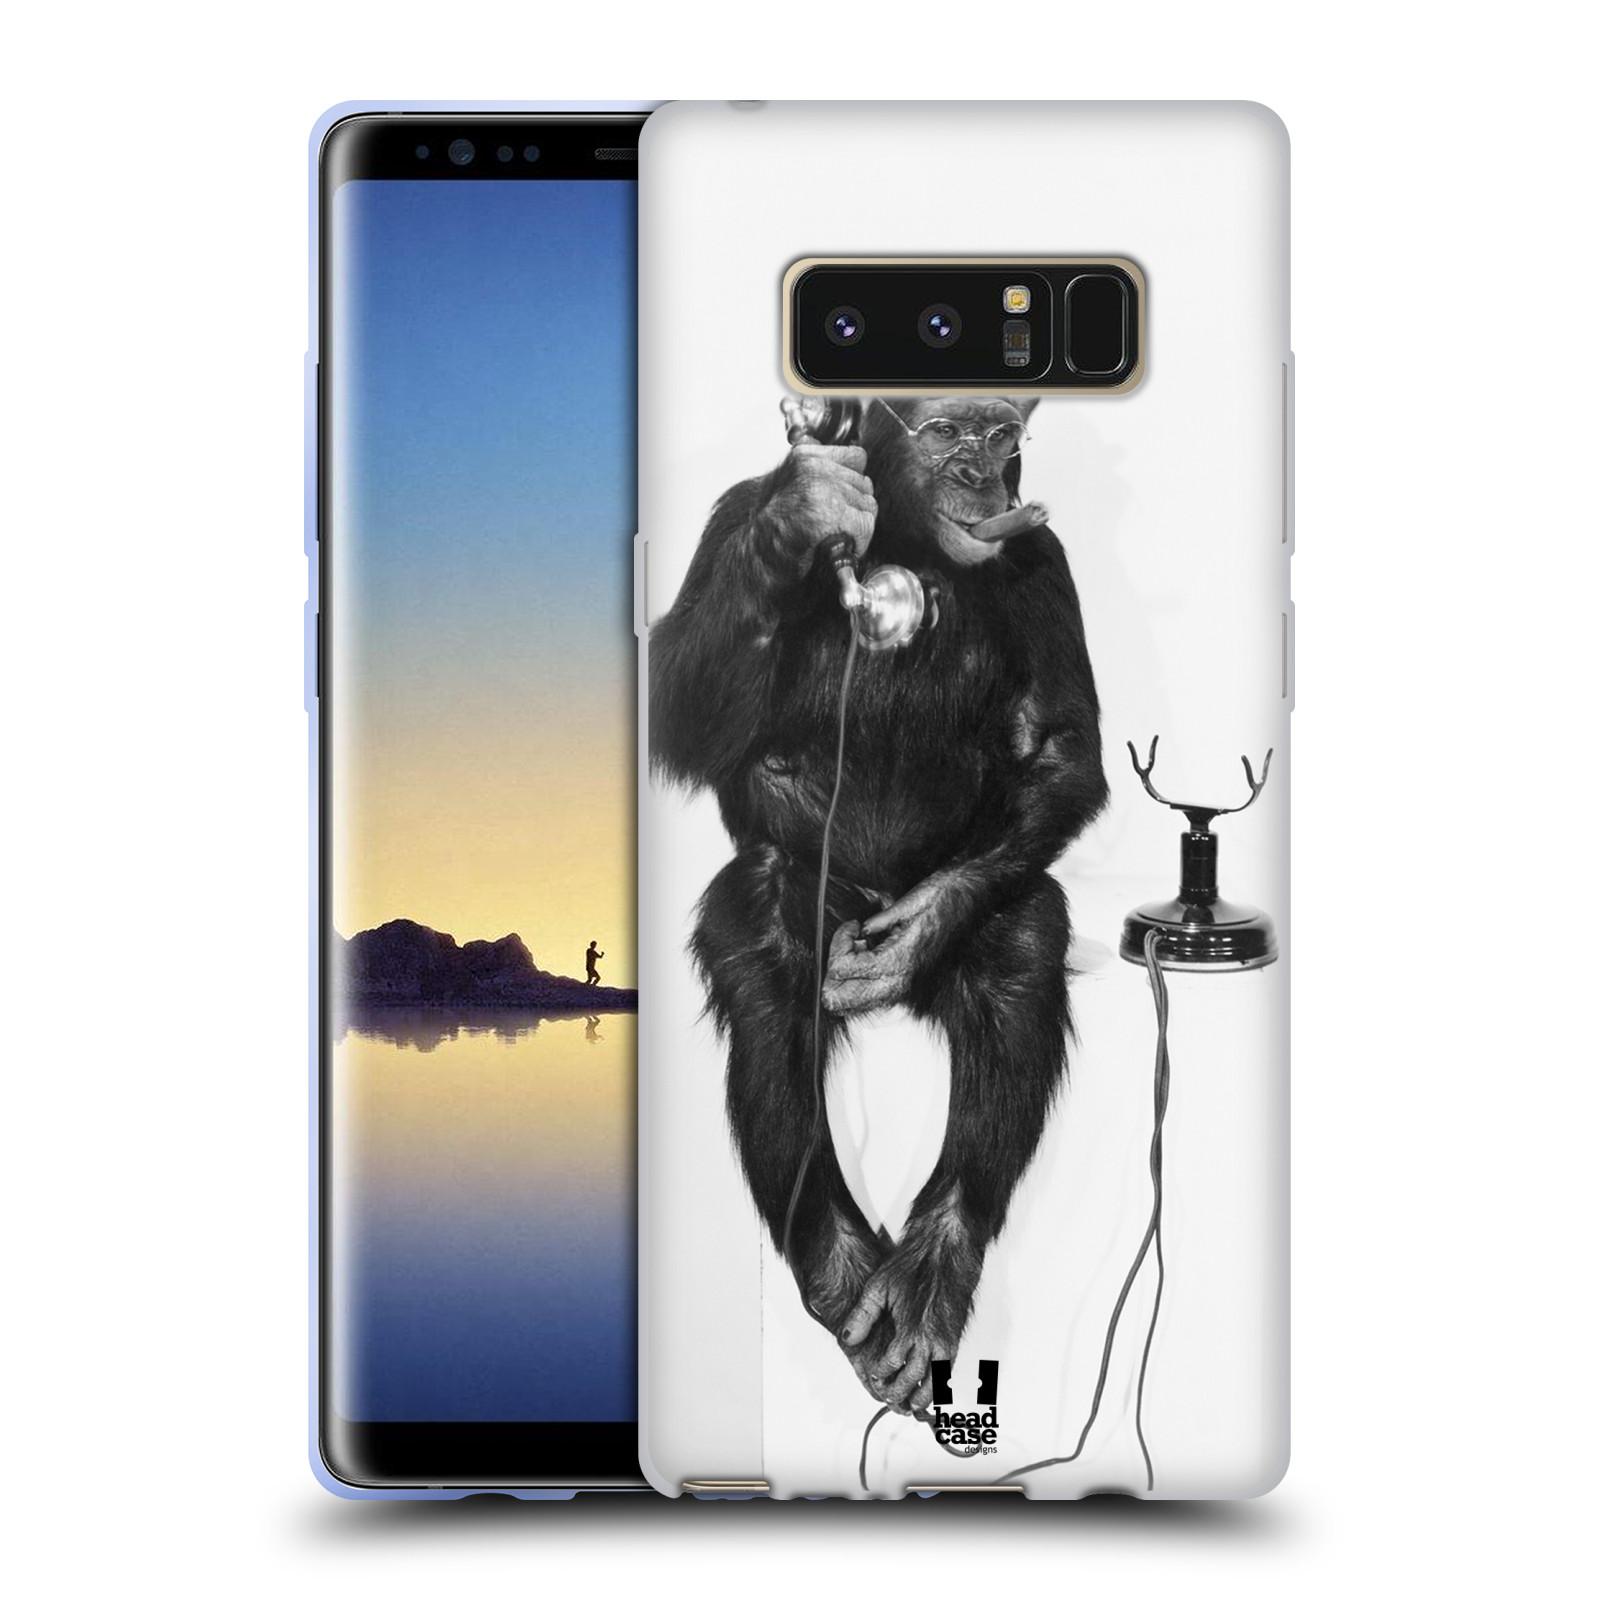 Silikonové pouzdro na mobil Samsung Galaxy Note 8 - Head Case - OPIČÁK S TELEFONEM (Silikonový kryt či obal na mobilní telefon Samsung Galaxy Note 8 SM-N950 s motivem OPIČÁK S TELEFONEM)